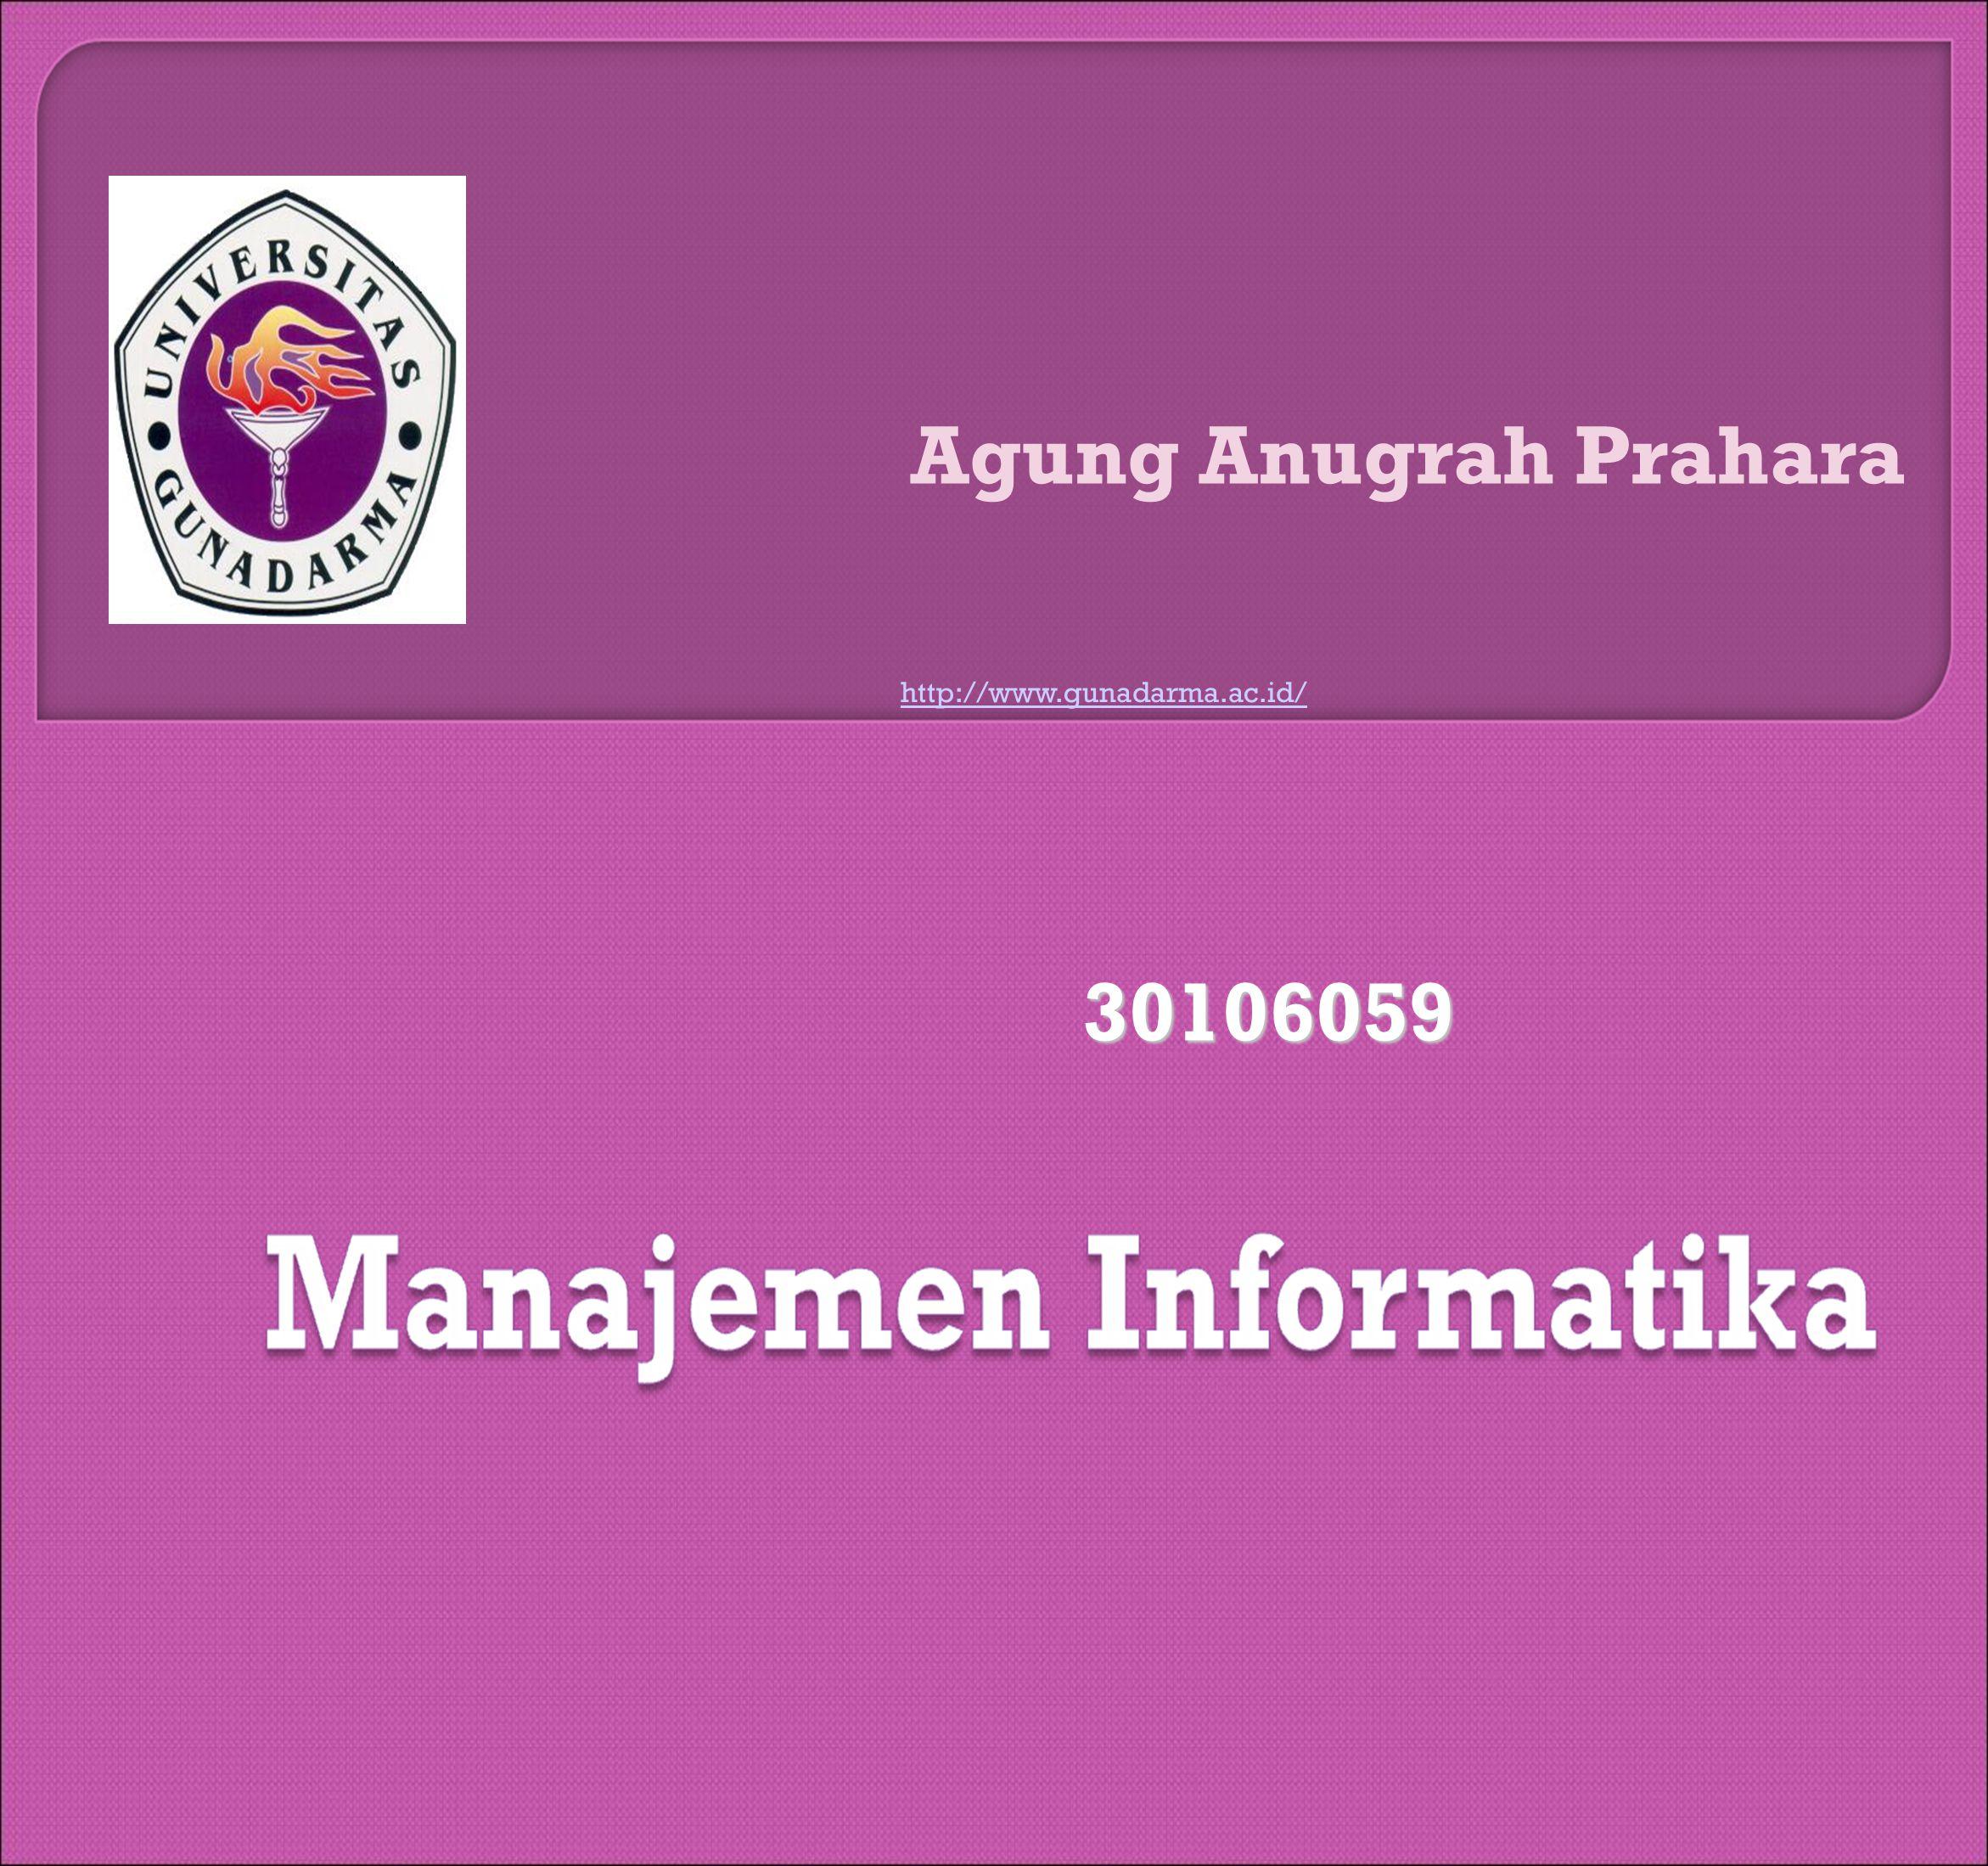 Agung Anugrah Prahara 30106059 http://www.gunadarma.ac.id/